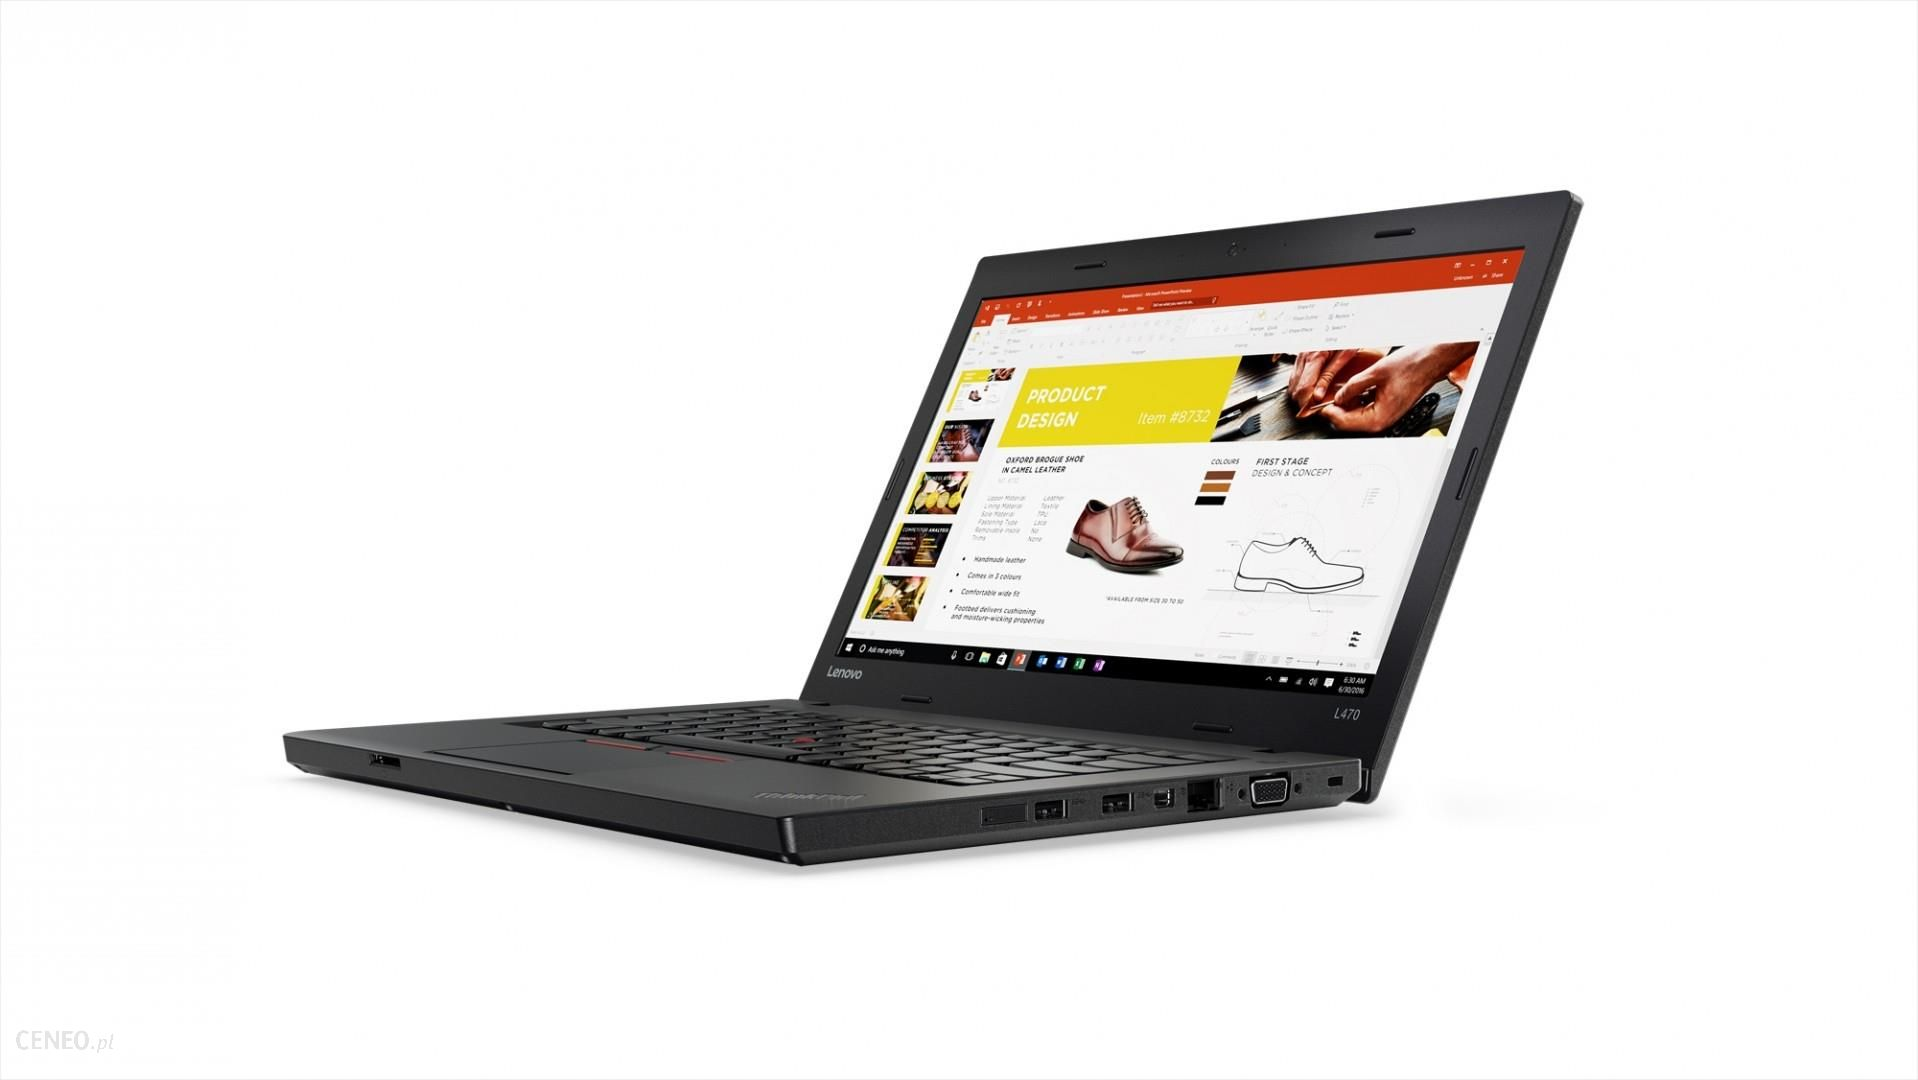 Laptop Lenovo ThinkPad L470 20J4000LPB zdjęcie 1